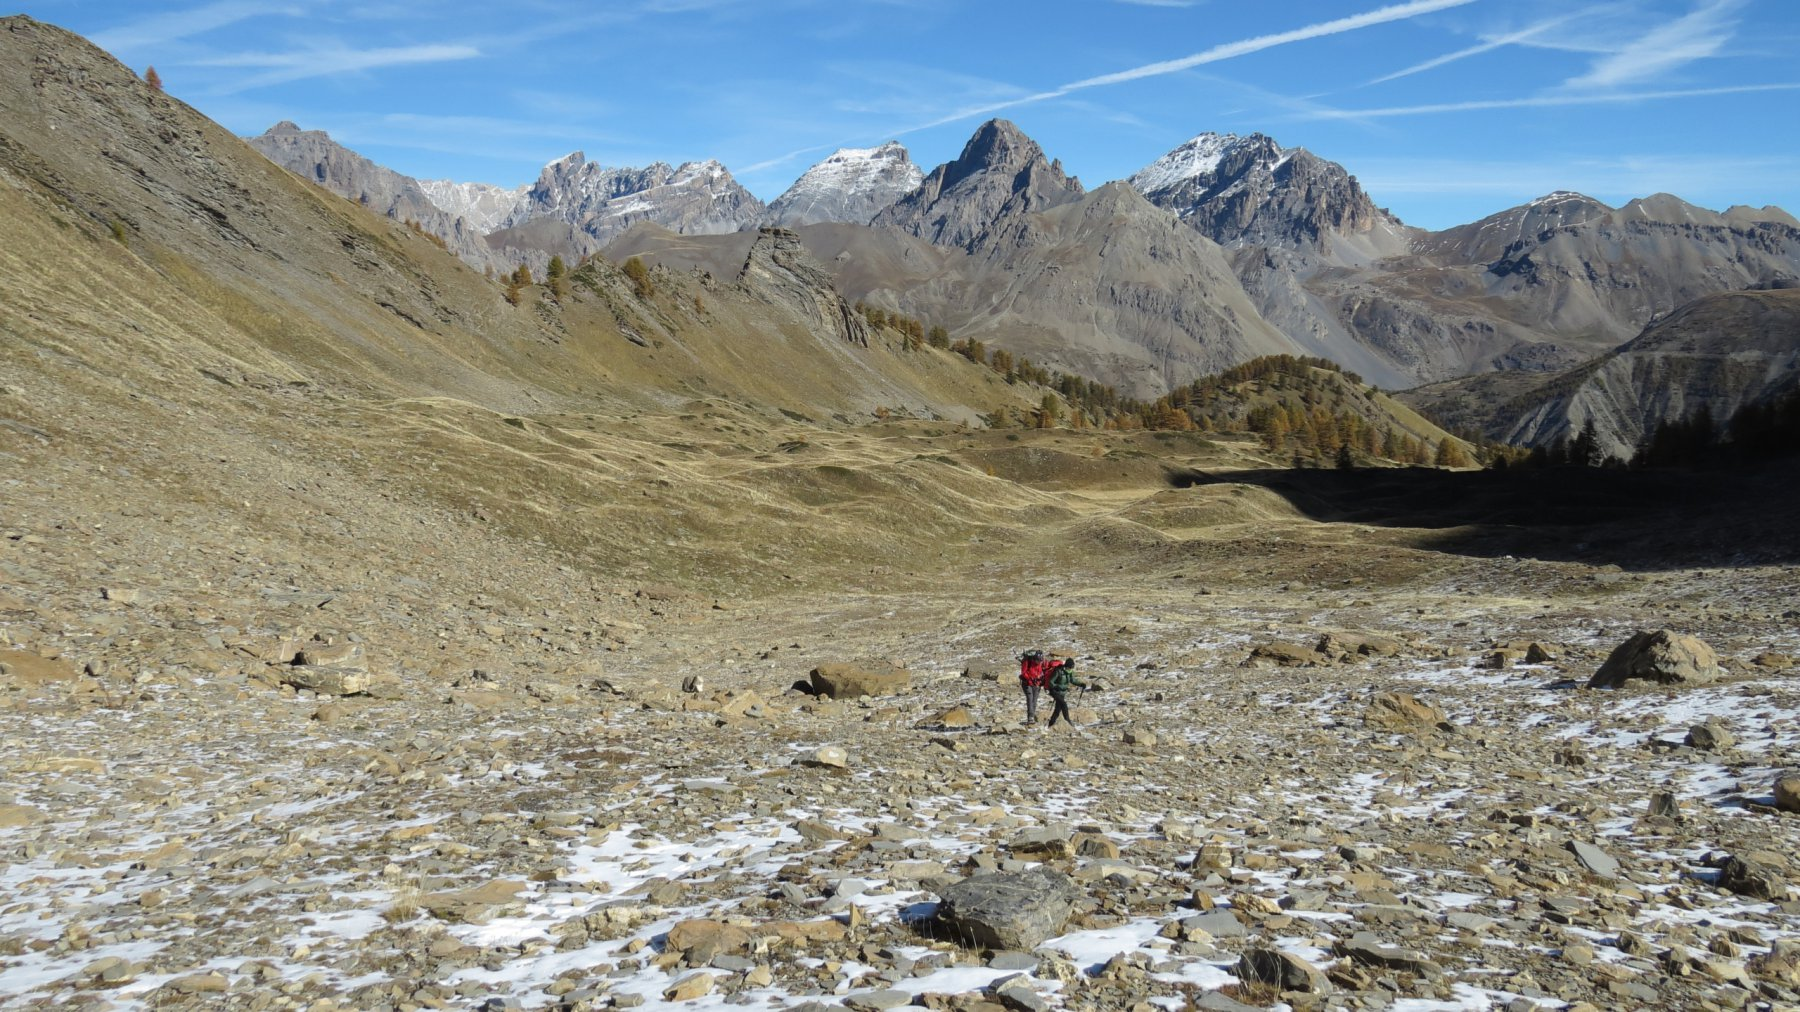 risalendo il Vallon de Font Crèse a quota 2400 m (17-10-2015)